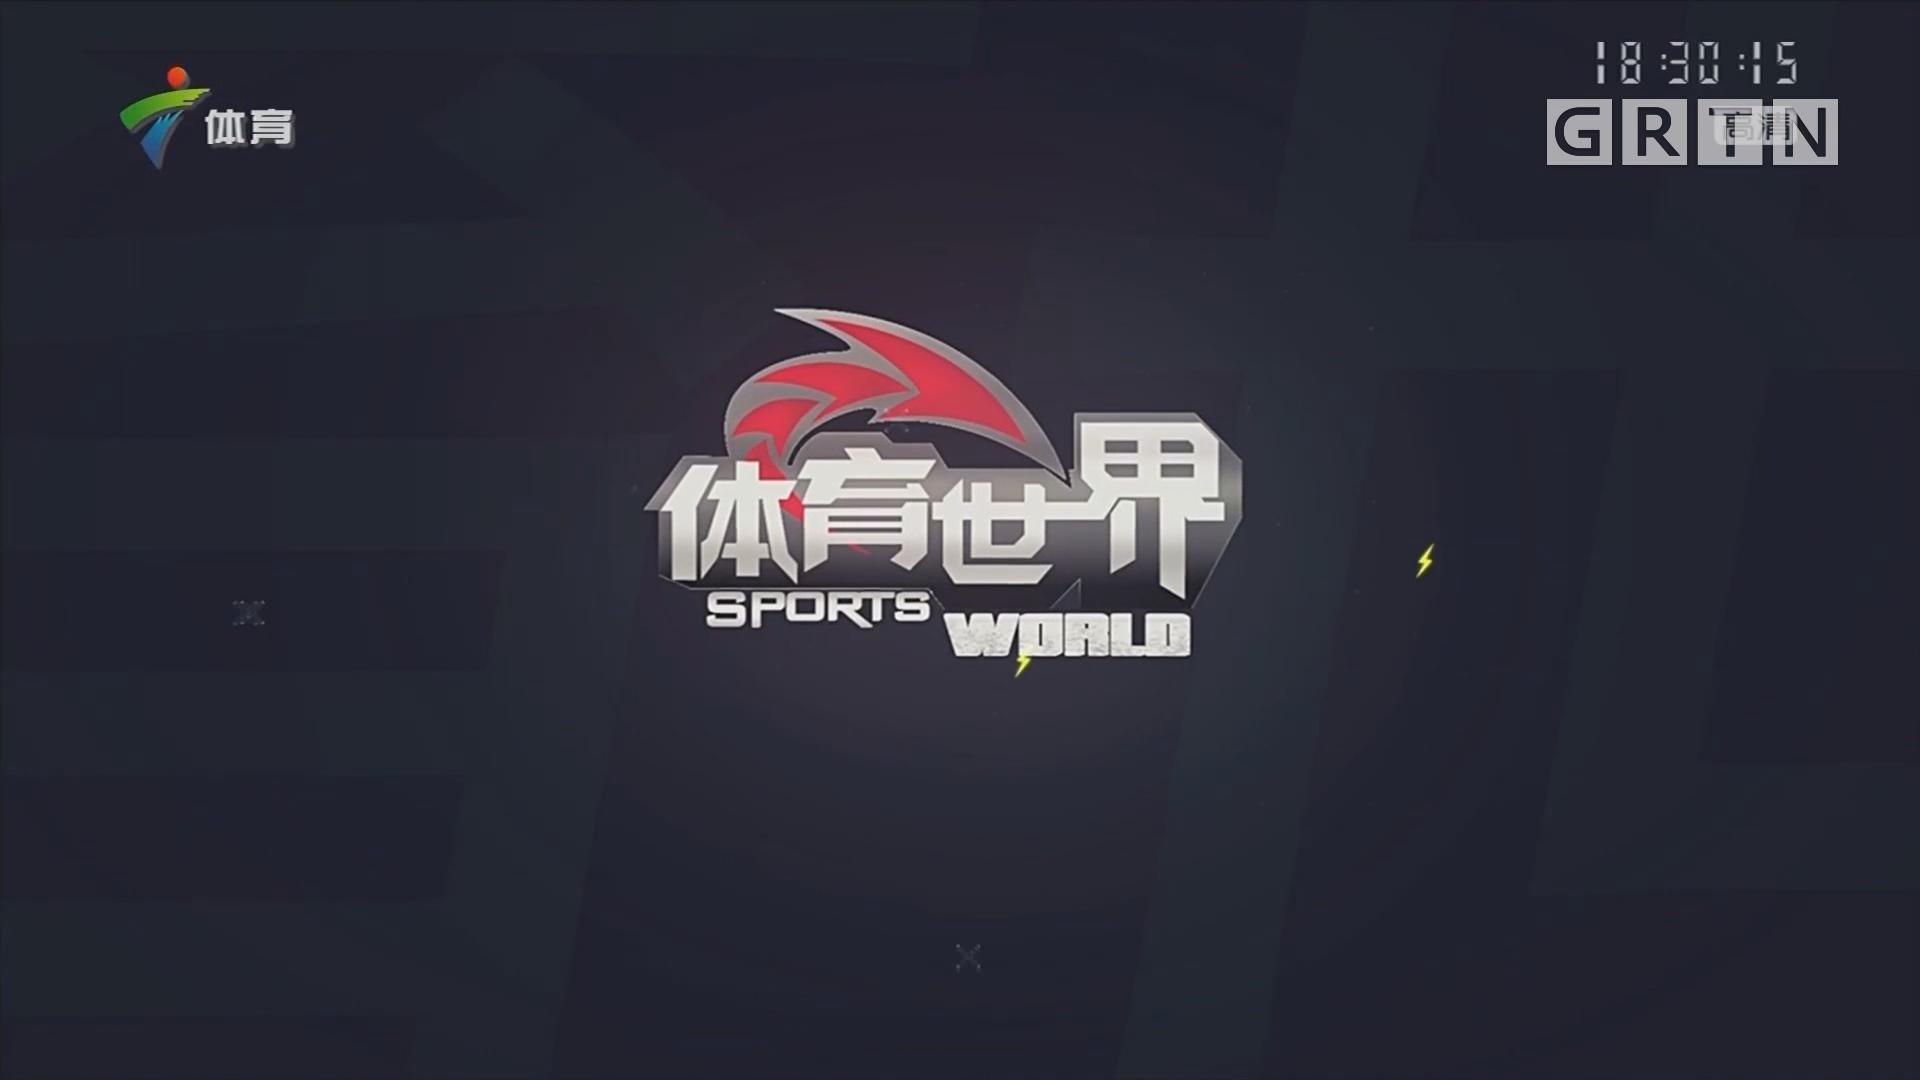 [HD][2019-02-28]体育世界:迎战卫冕冠军 广东女篮夺得半决赛开门红